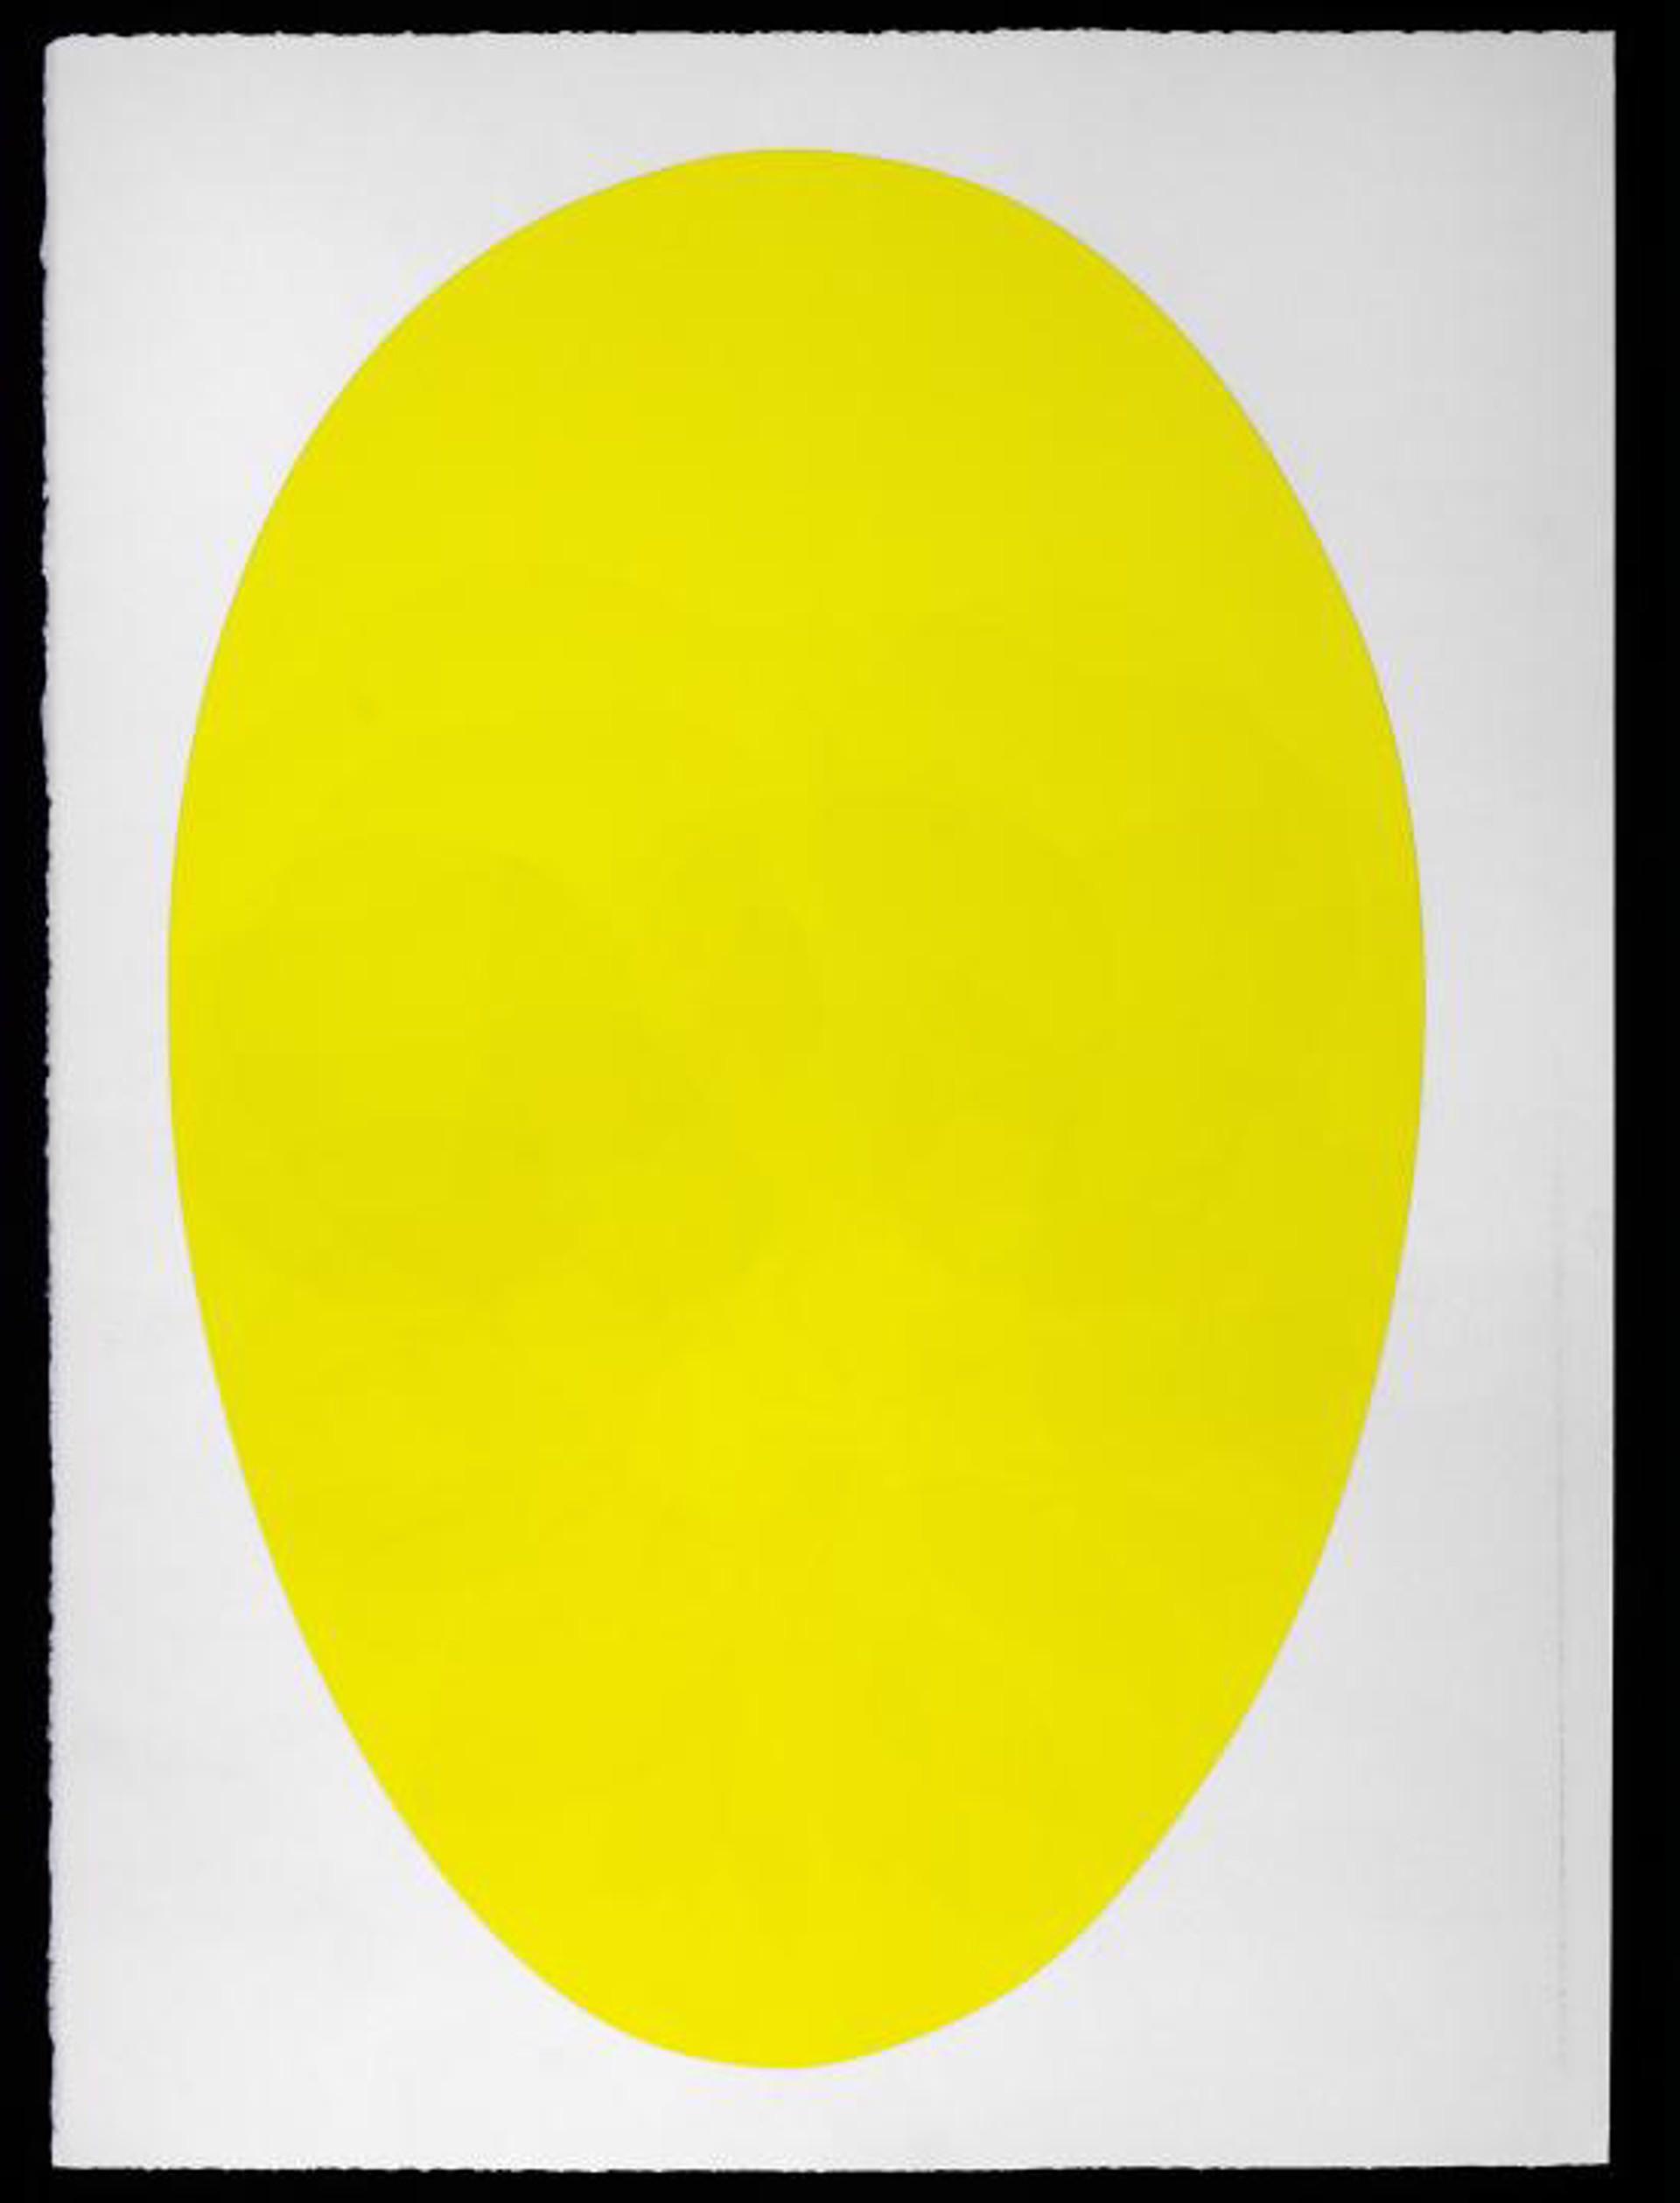 Lanterne Chinoise (LC 1-5) by John Armleder